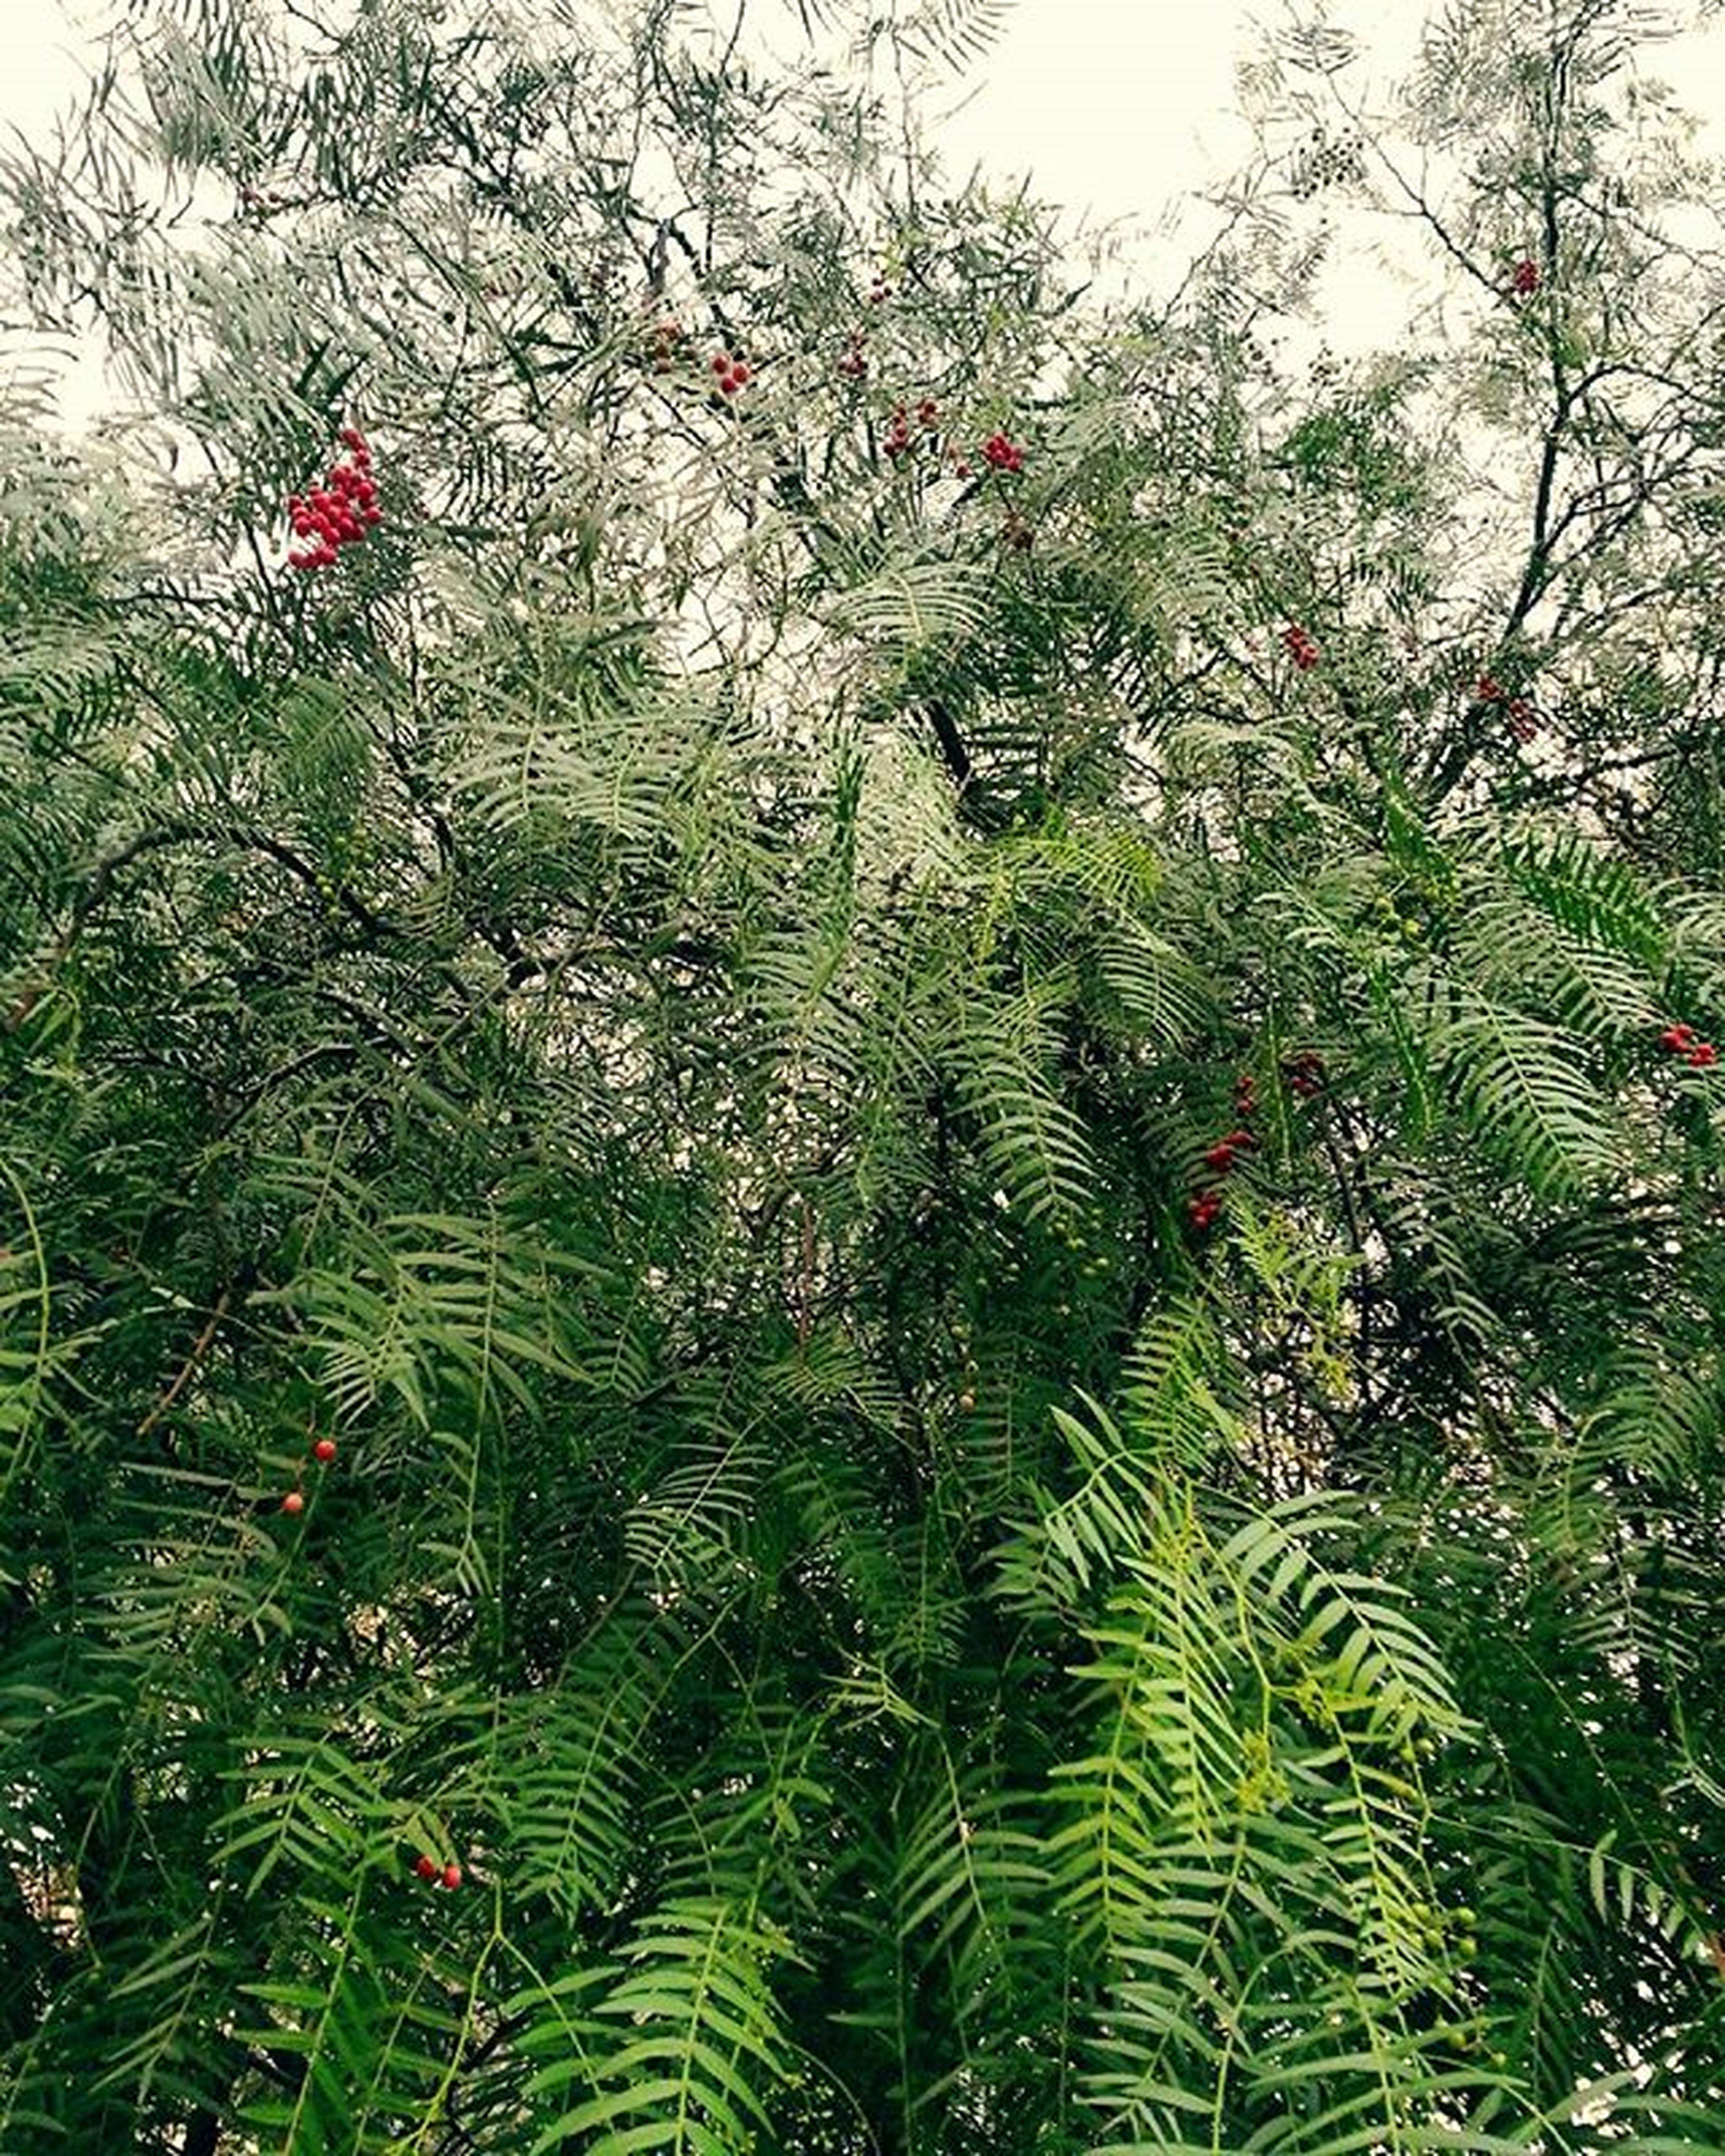 Jungle in CBD: 160513 Melbourne Australia Jungle in CBD Streetview Trees Leaves Green Waitingforsummer Sleepygiraffe 멜번 초록 정글 거리